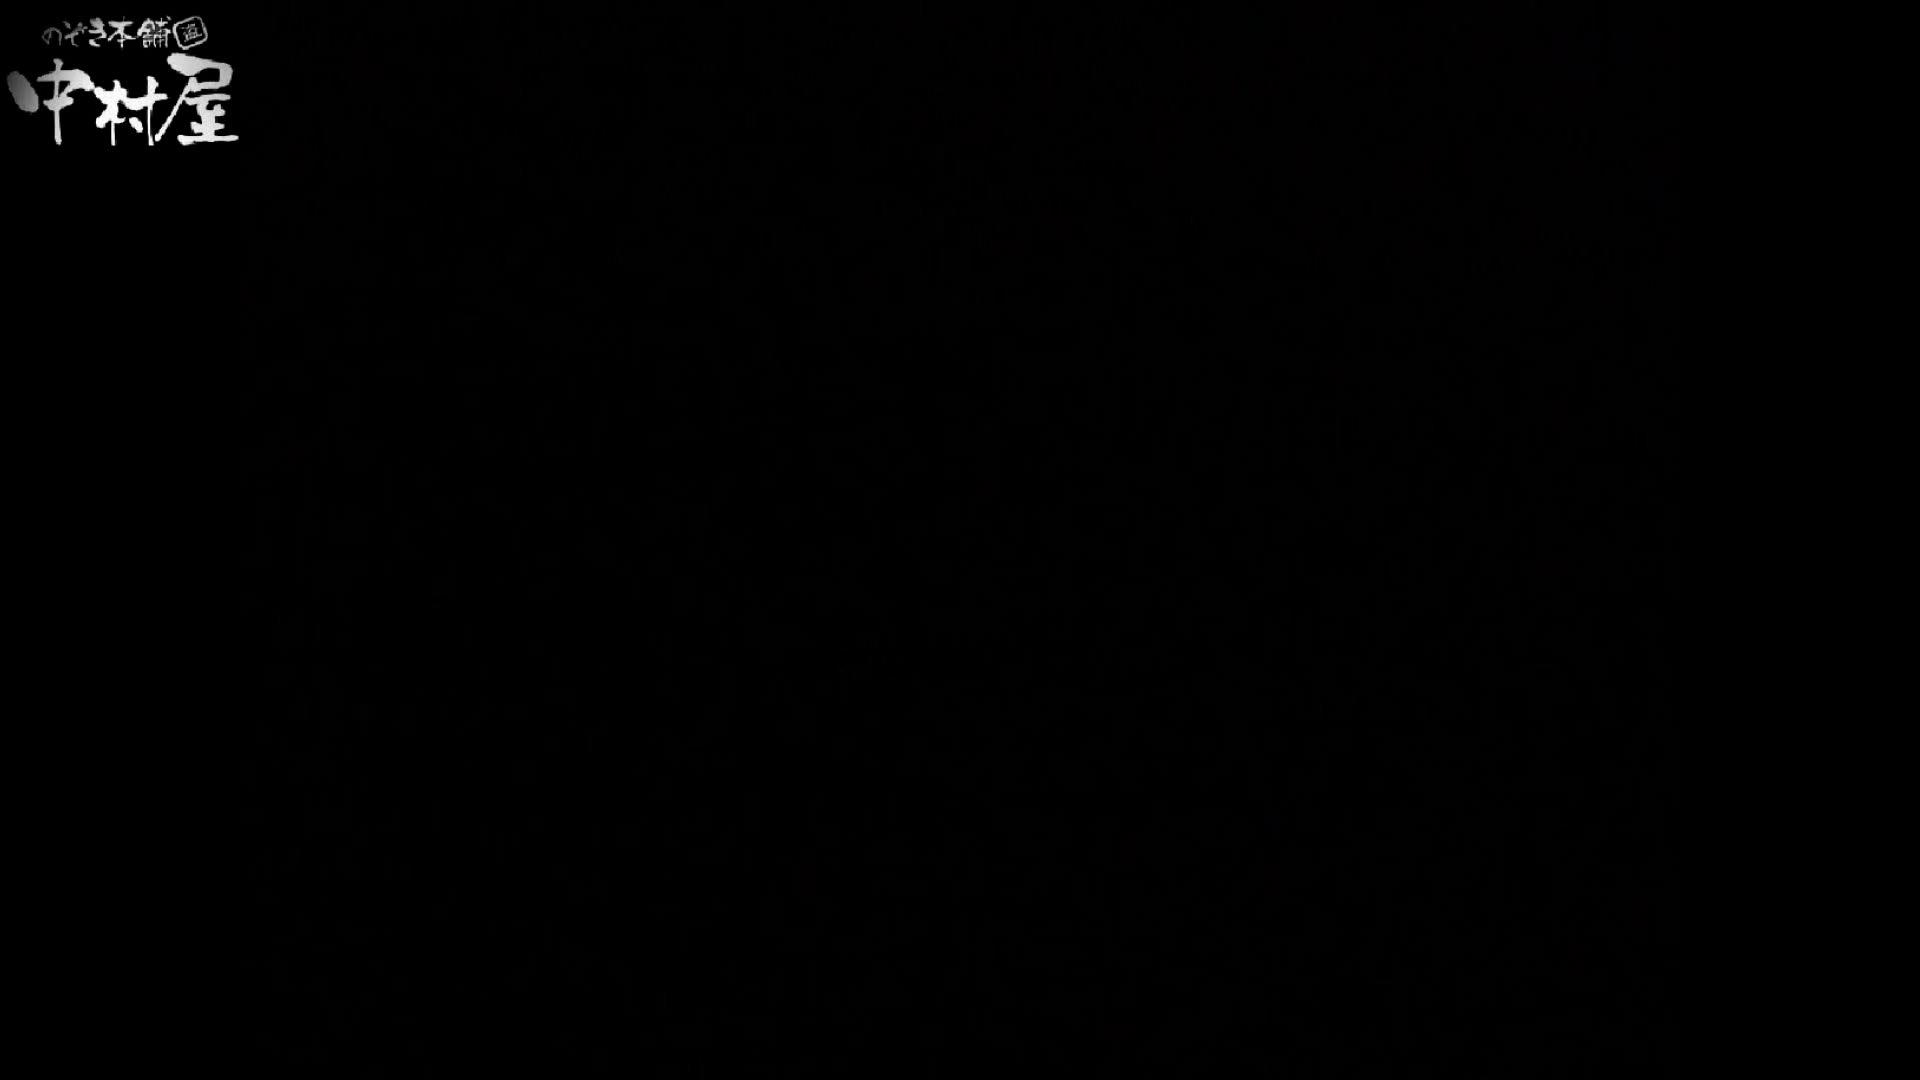 民家風呂専門盗撮師の超危険映像 vol.022 お色気美少女 ヌード画像 93枚 29